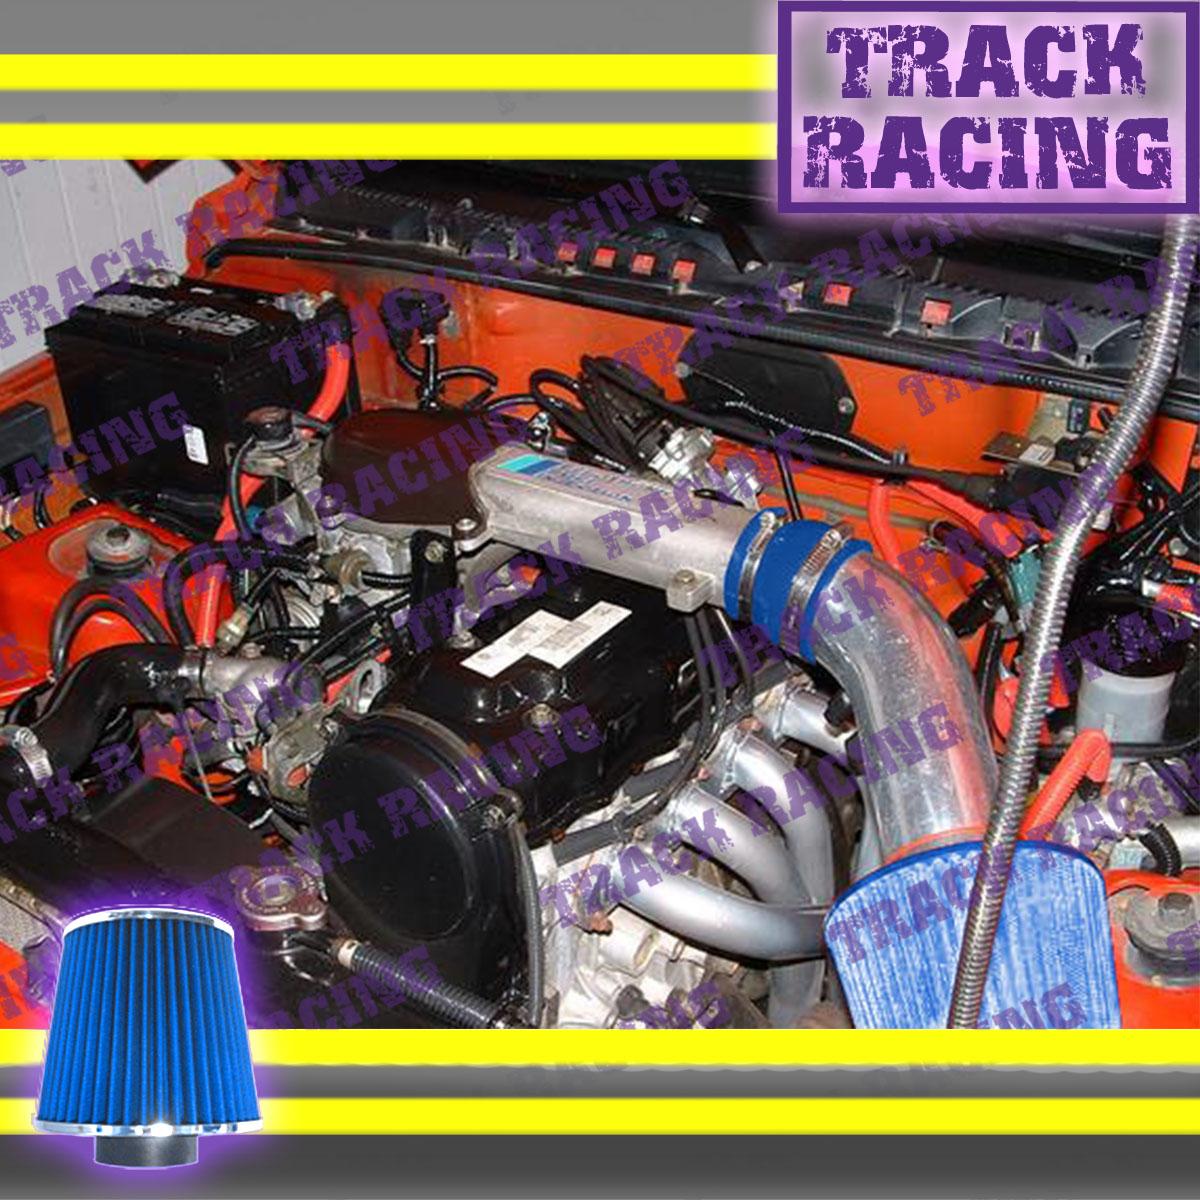 [SCHEMATICS_4UK]  SPORT AIR INTAKE SYSTEM BLACK DRY FILTER For 89-94 Geo Tracker SUV 1.6L L4 | 94 Geo Tracker Fuel Filter |  | itfip